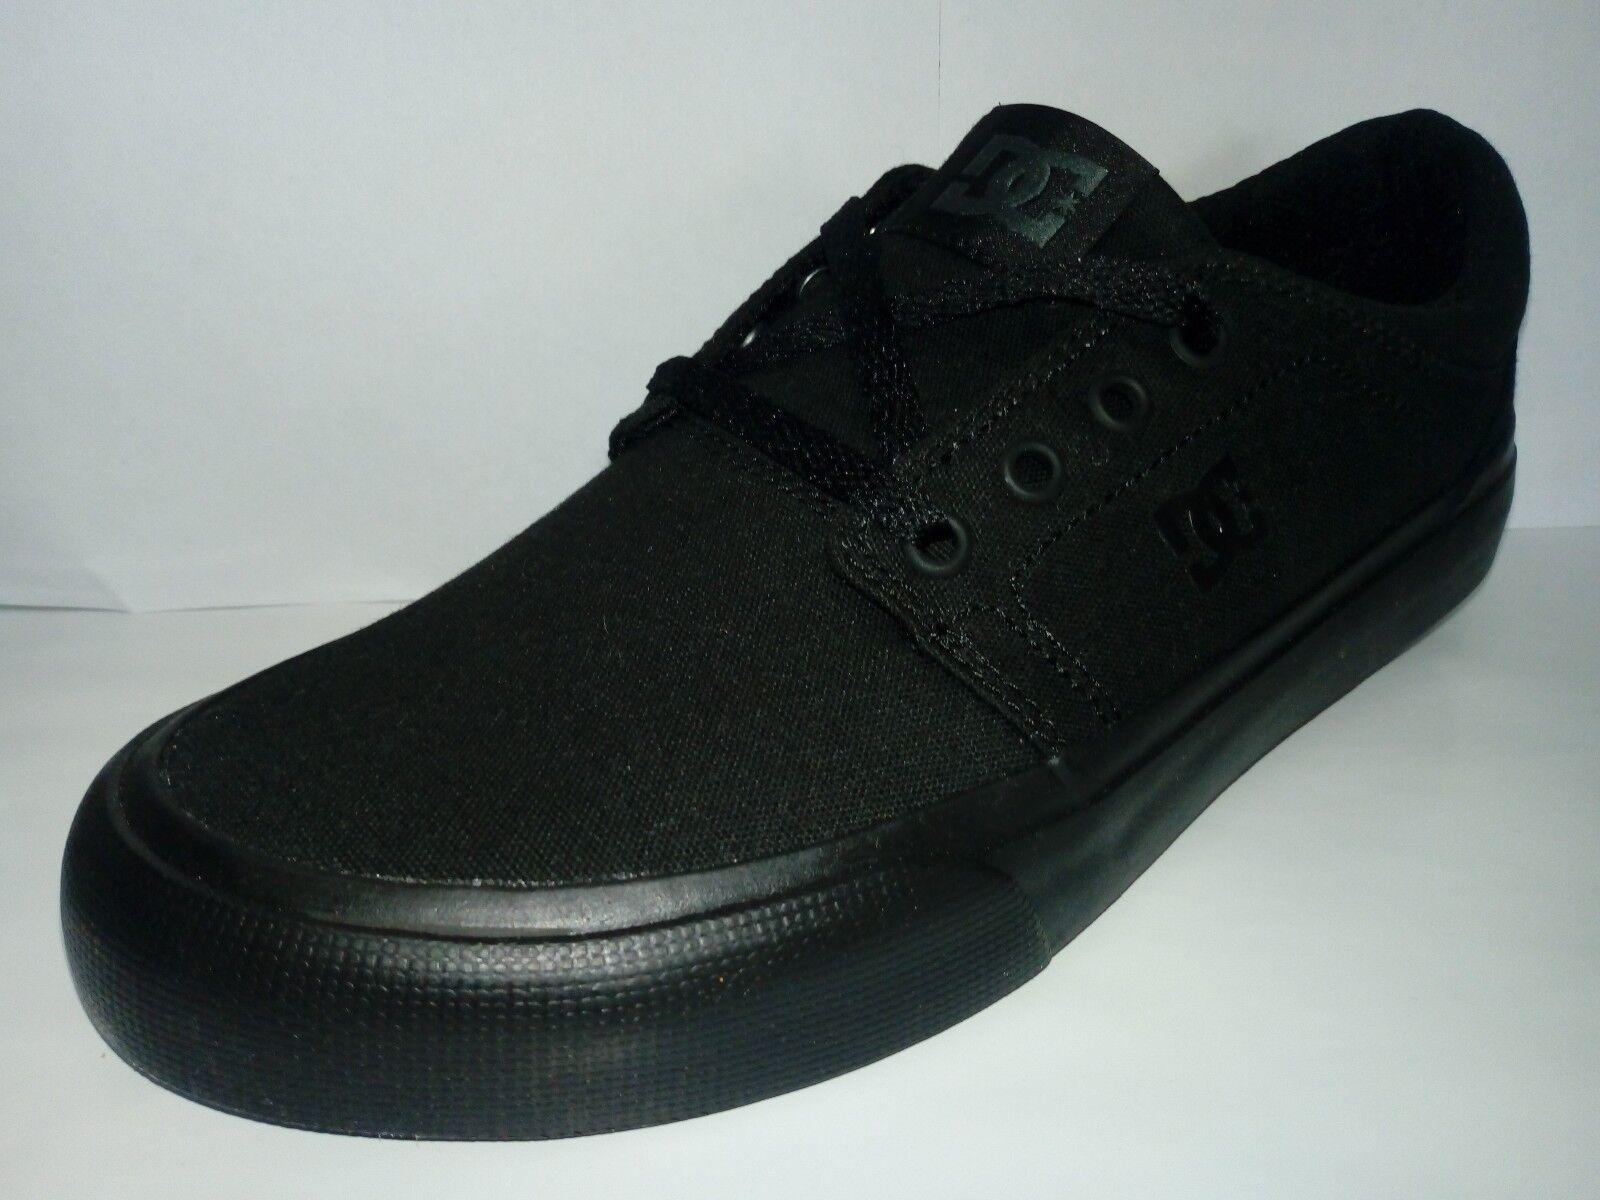 DC Zapatos in Trase in TX Zapatos hombre/mujer in Zapatos Trase Tela Negro Negro b41985